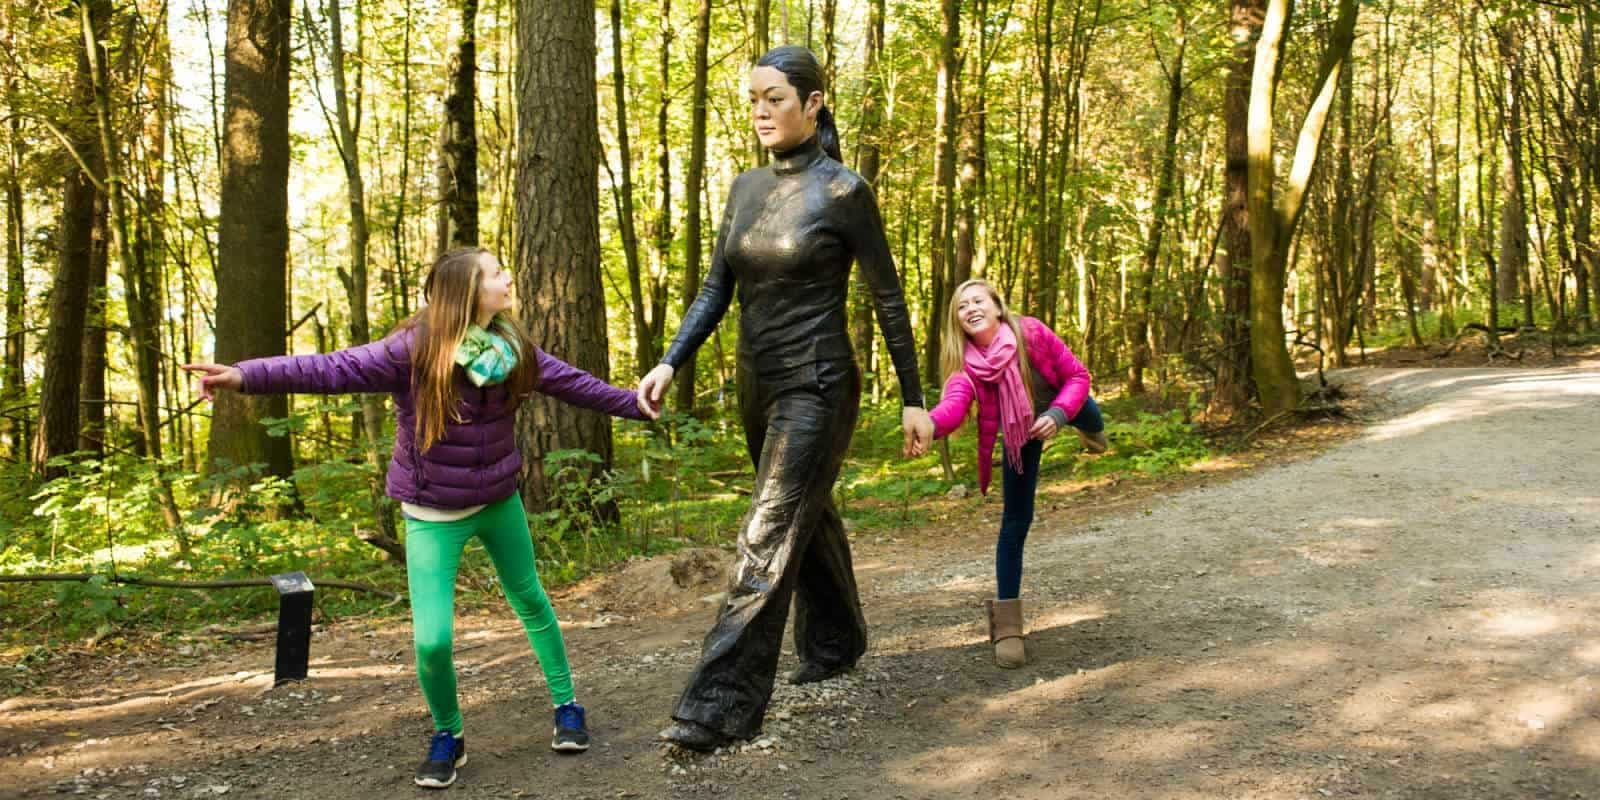 Asian Woman with children in Ekeberg Art park, Oslo, Norway